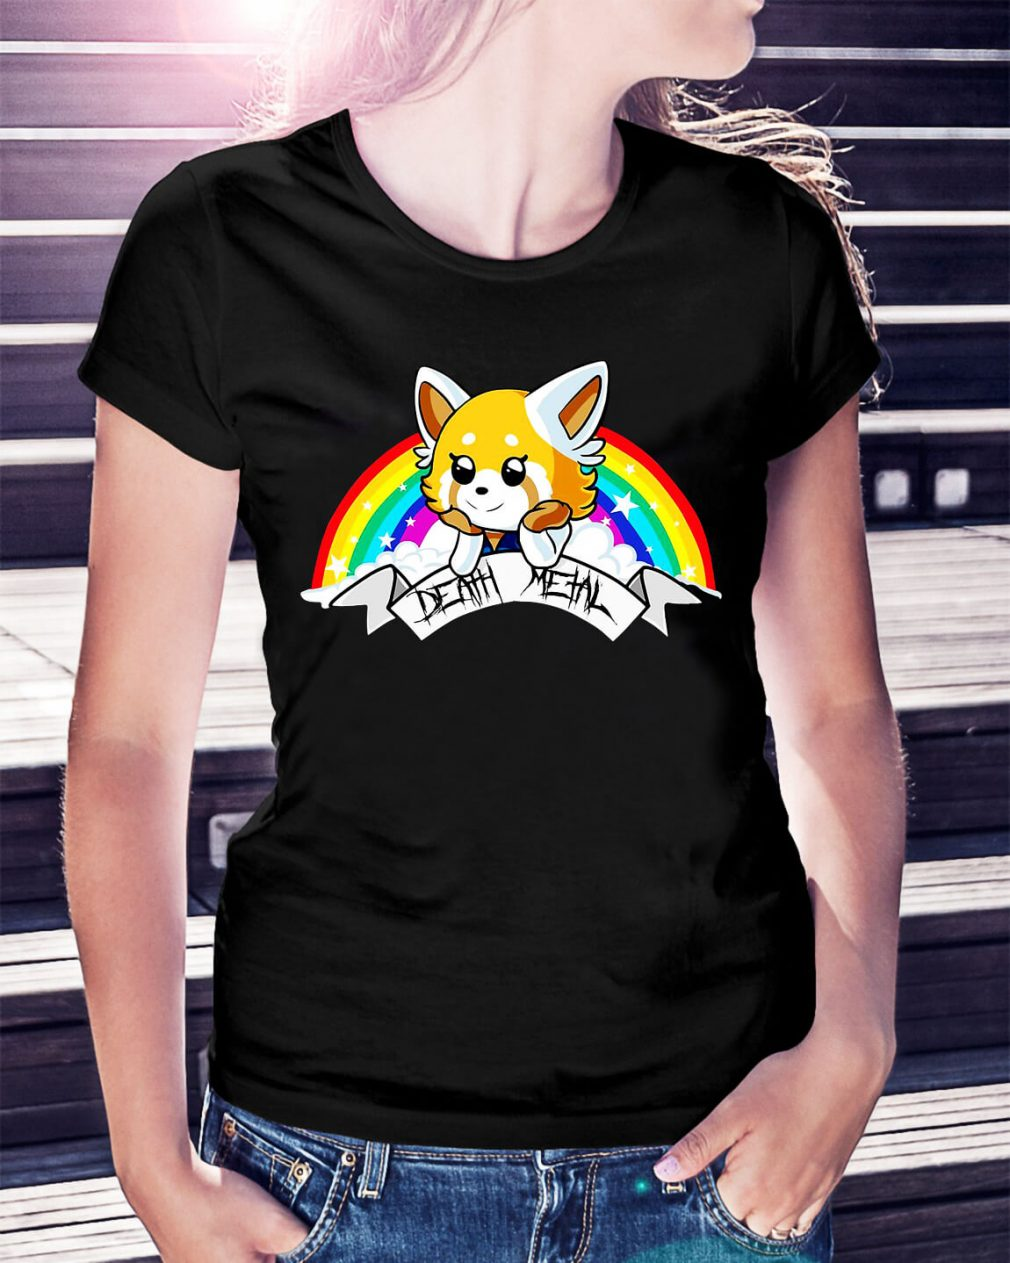 Death Metal rainbow shirt